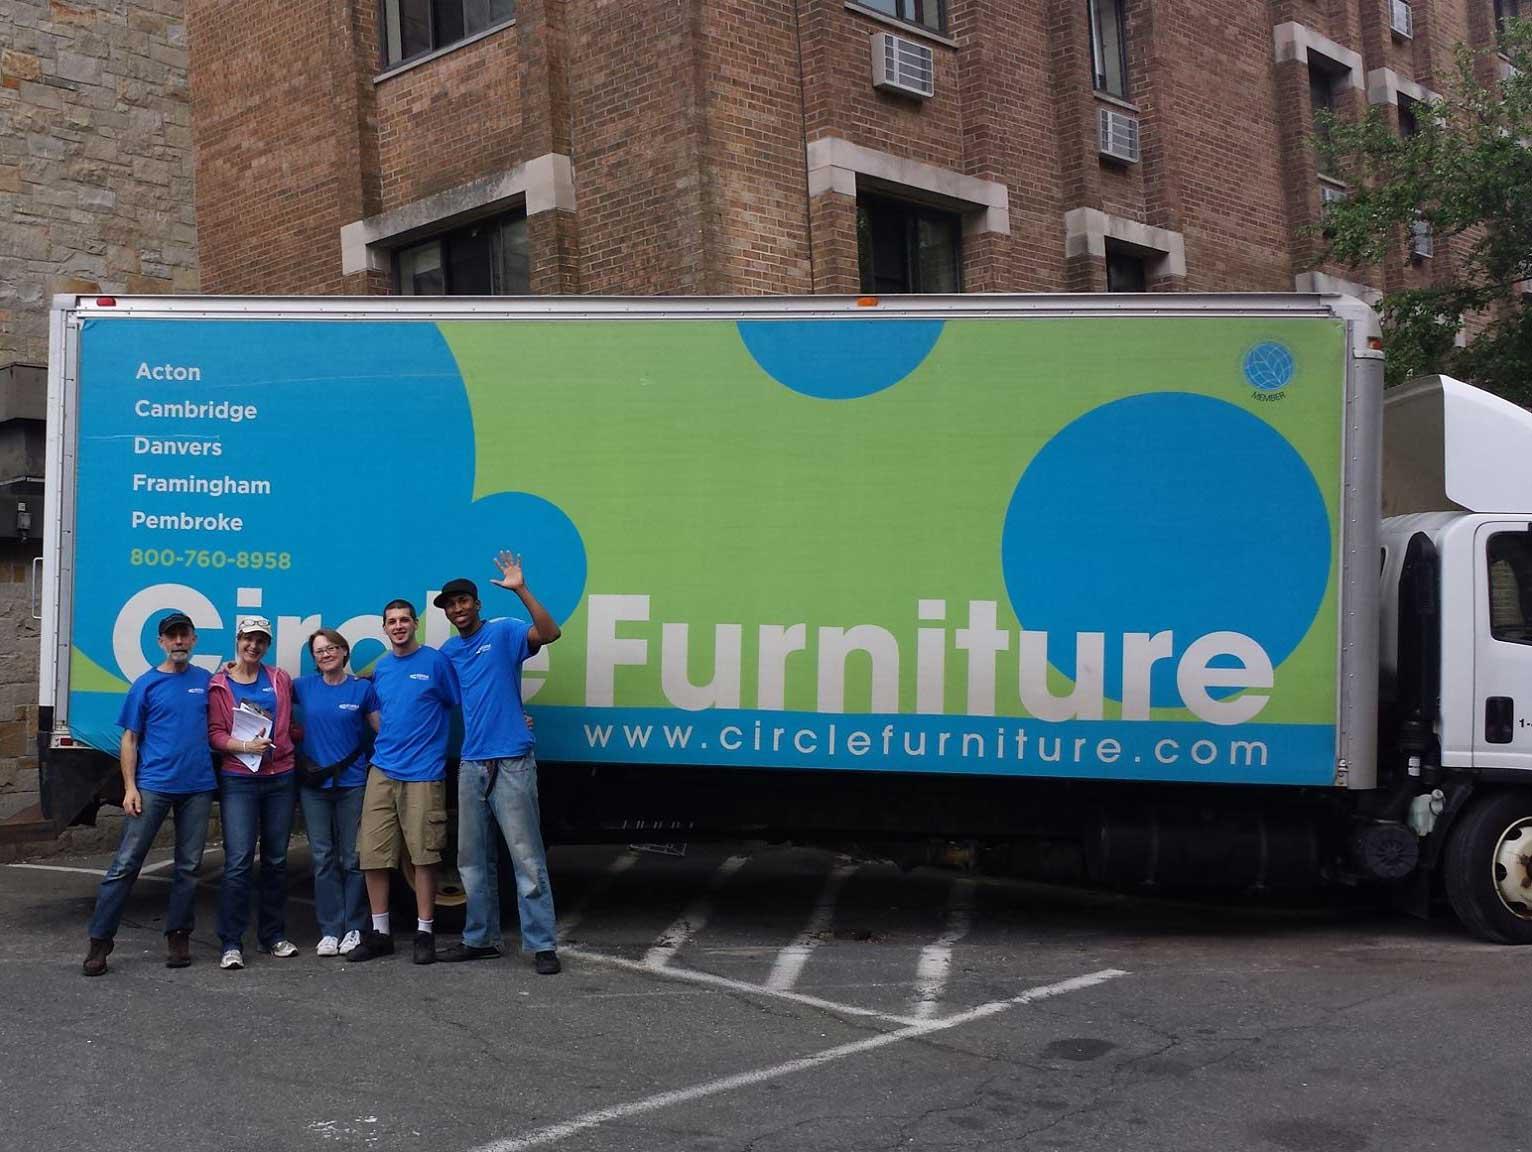 donate sofa to charity lane rv sleeper community service circle furniture truck and team